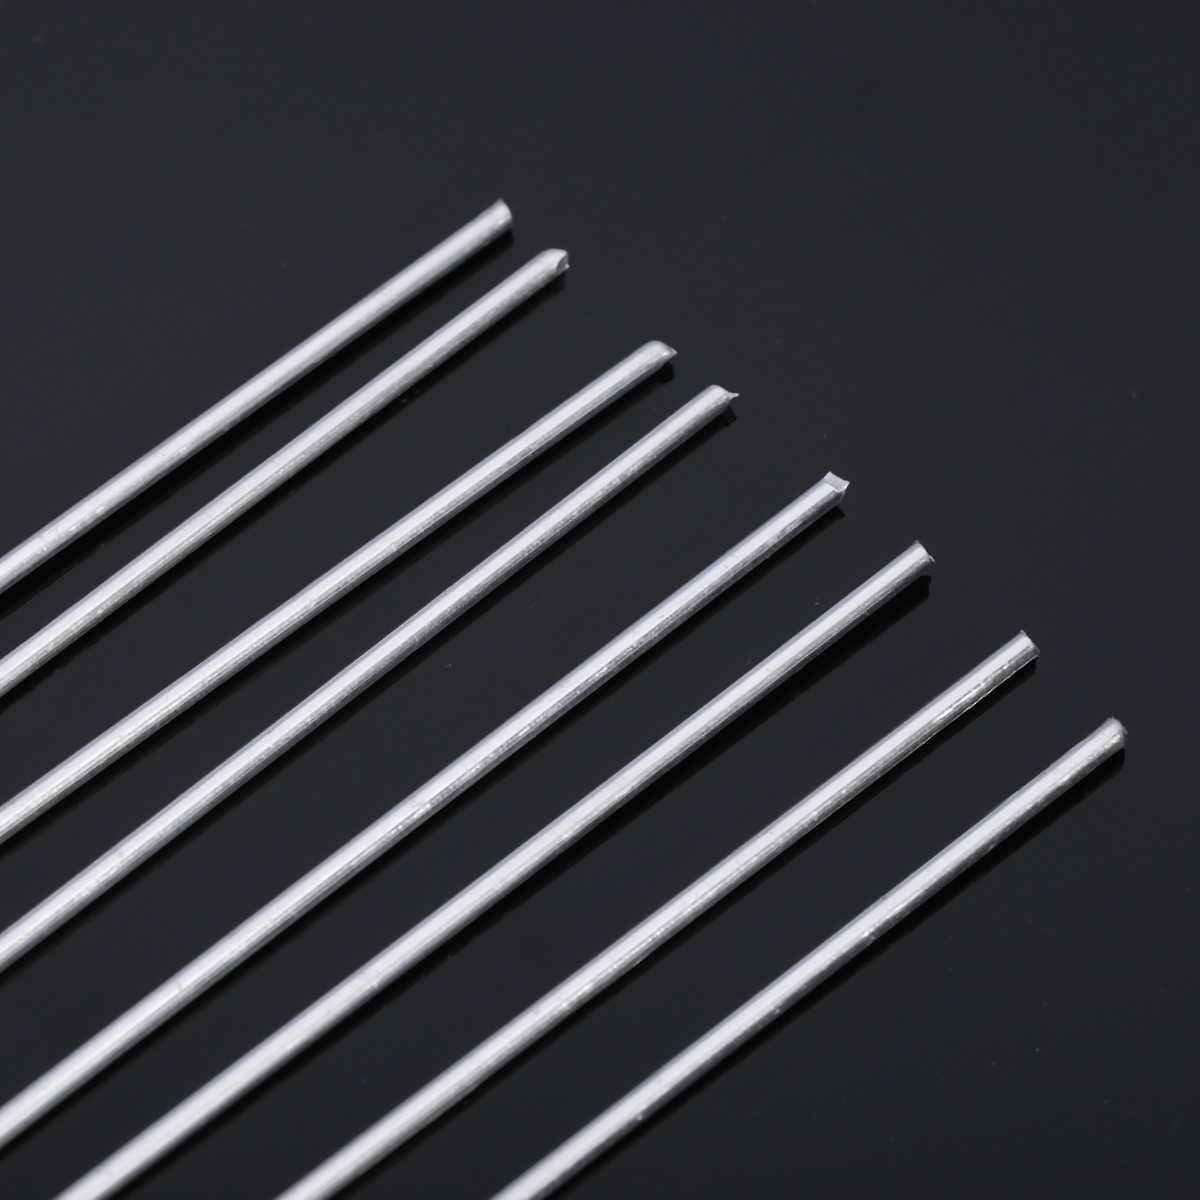 8 pcs Hastes de Soldadura de Soldadura Da Liga de Alumínio de Baixa Temperatura 2mm x 230mm Prata Para Solda Tig